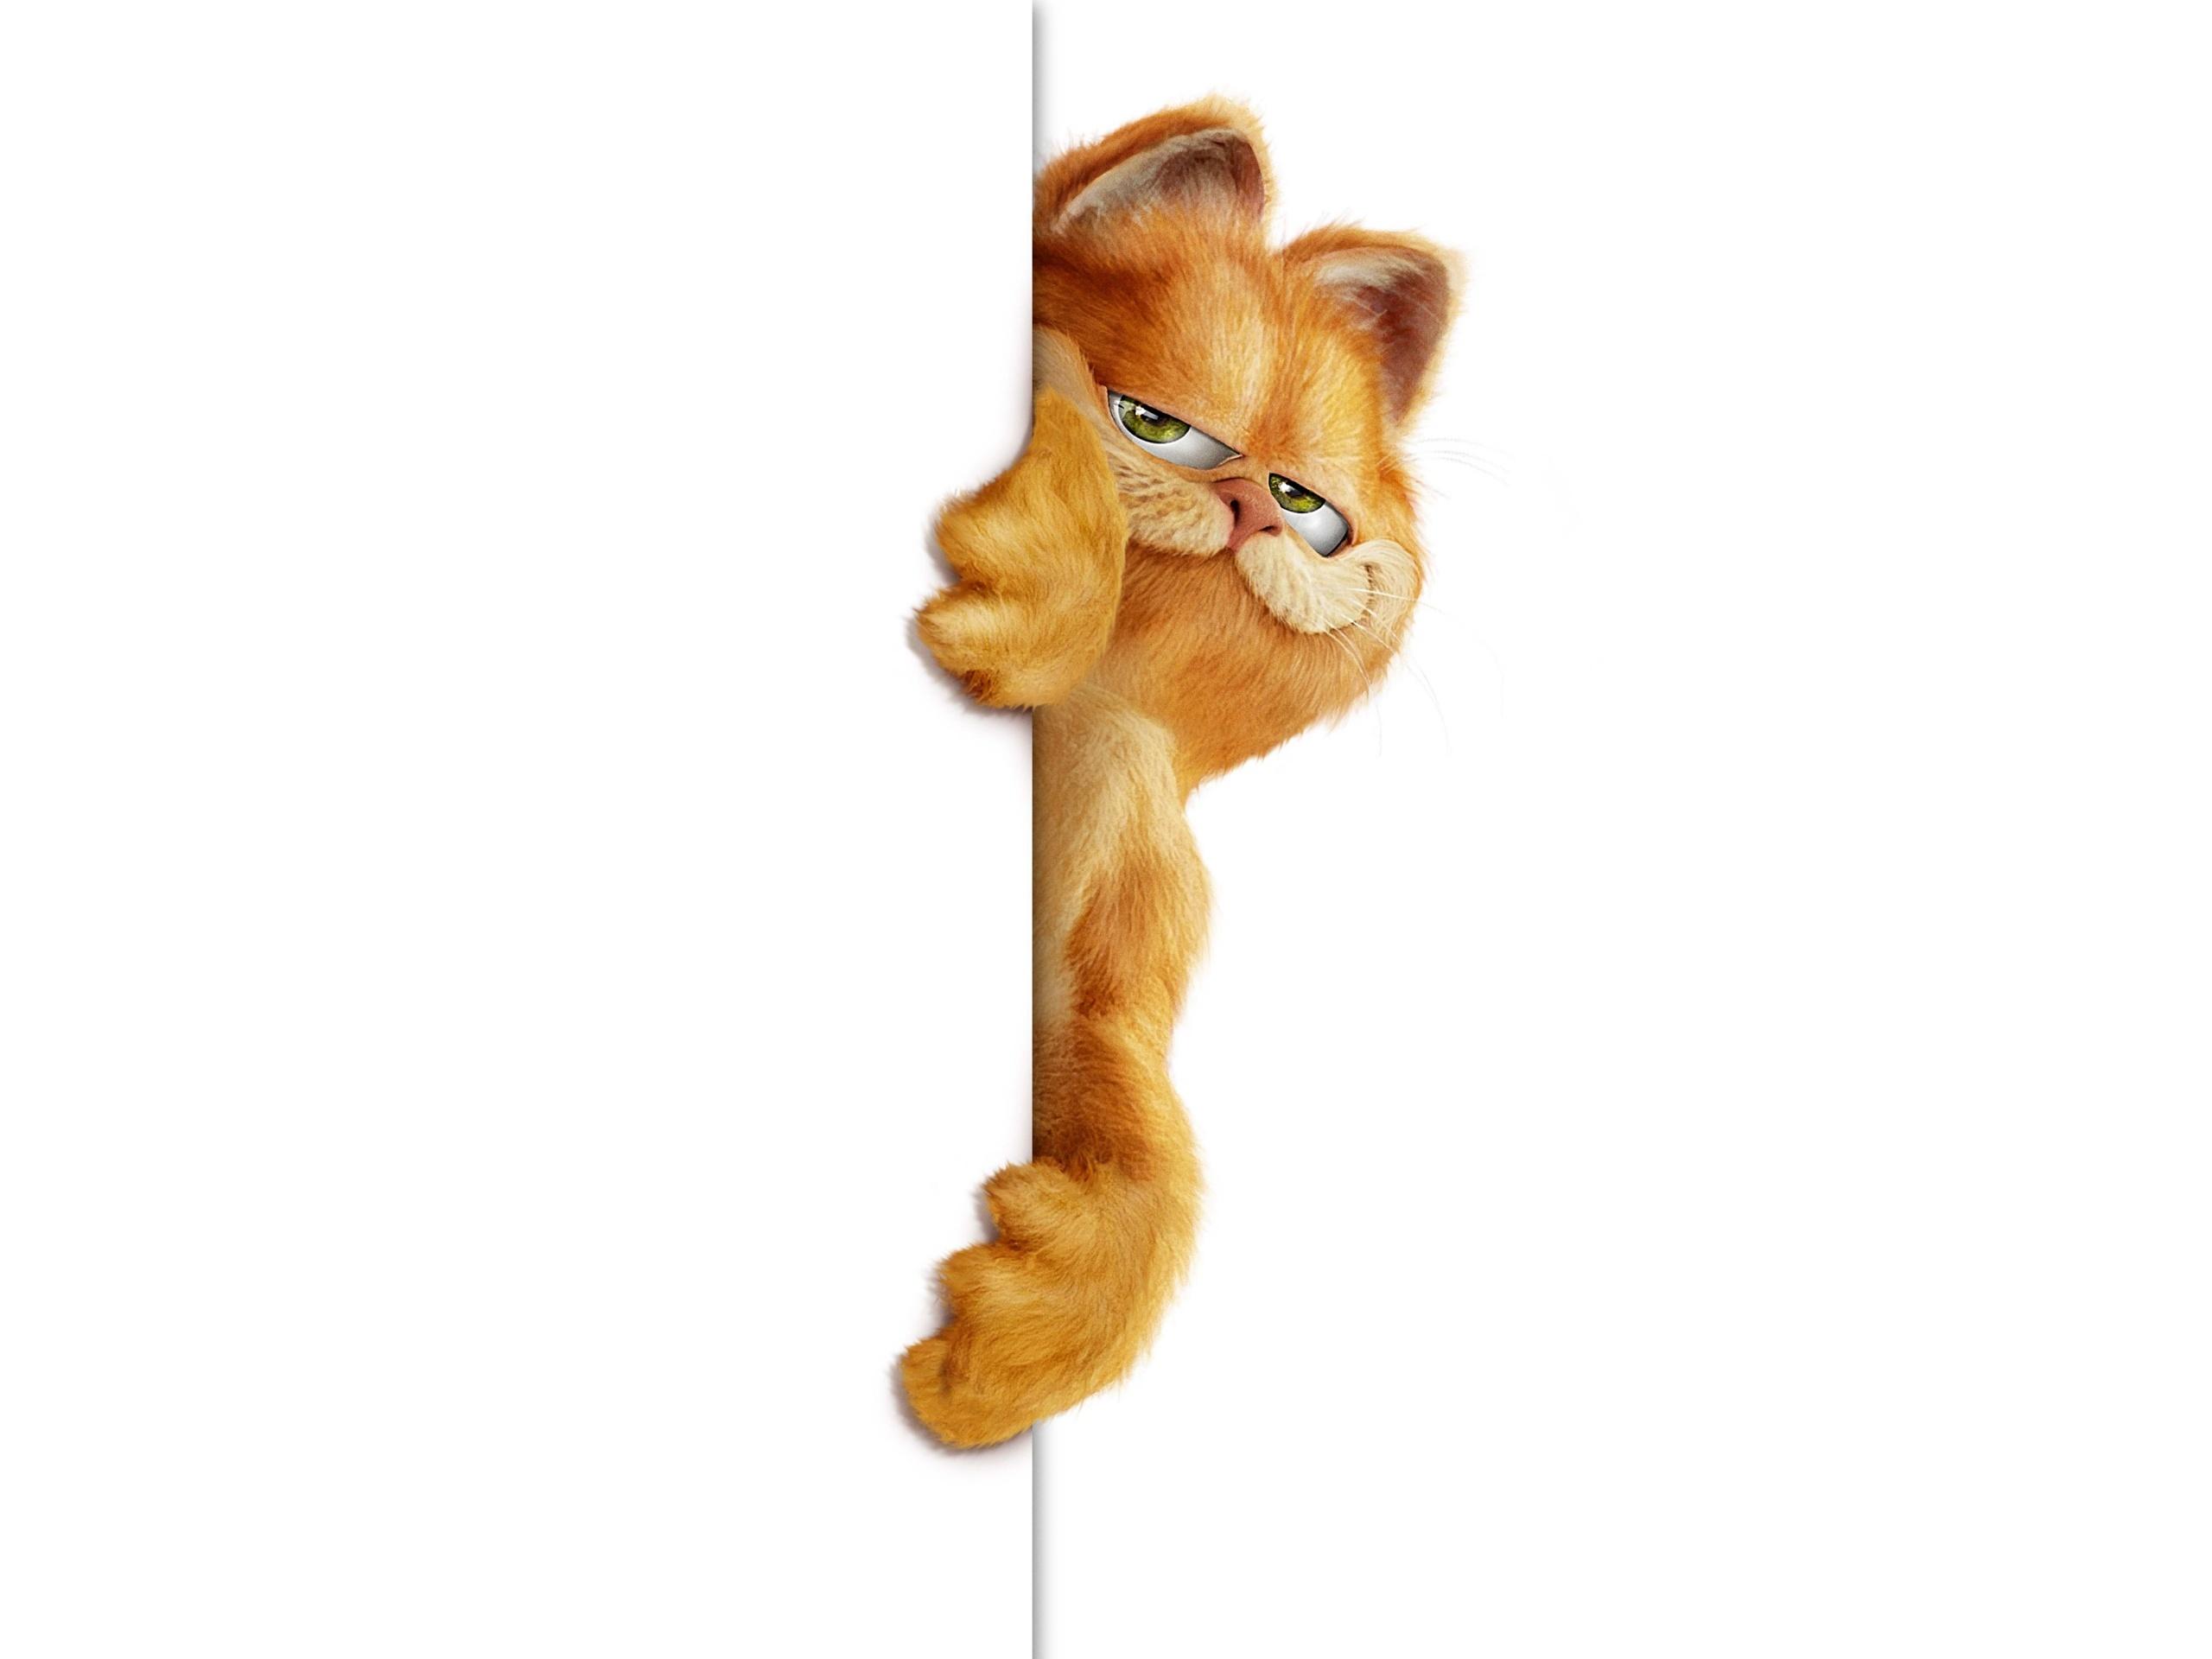 Unduh 61+  Gambar Kucing Garfield Asli Paling Imut Gratis